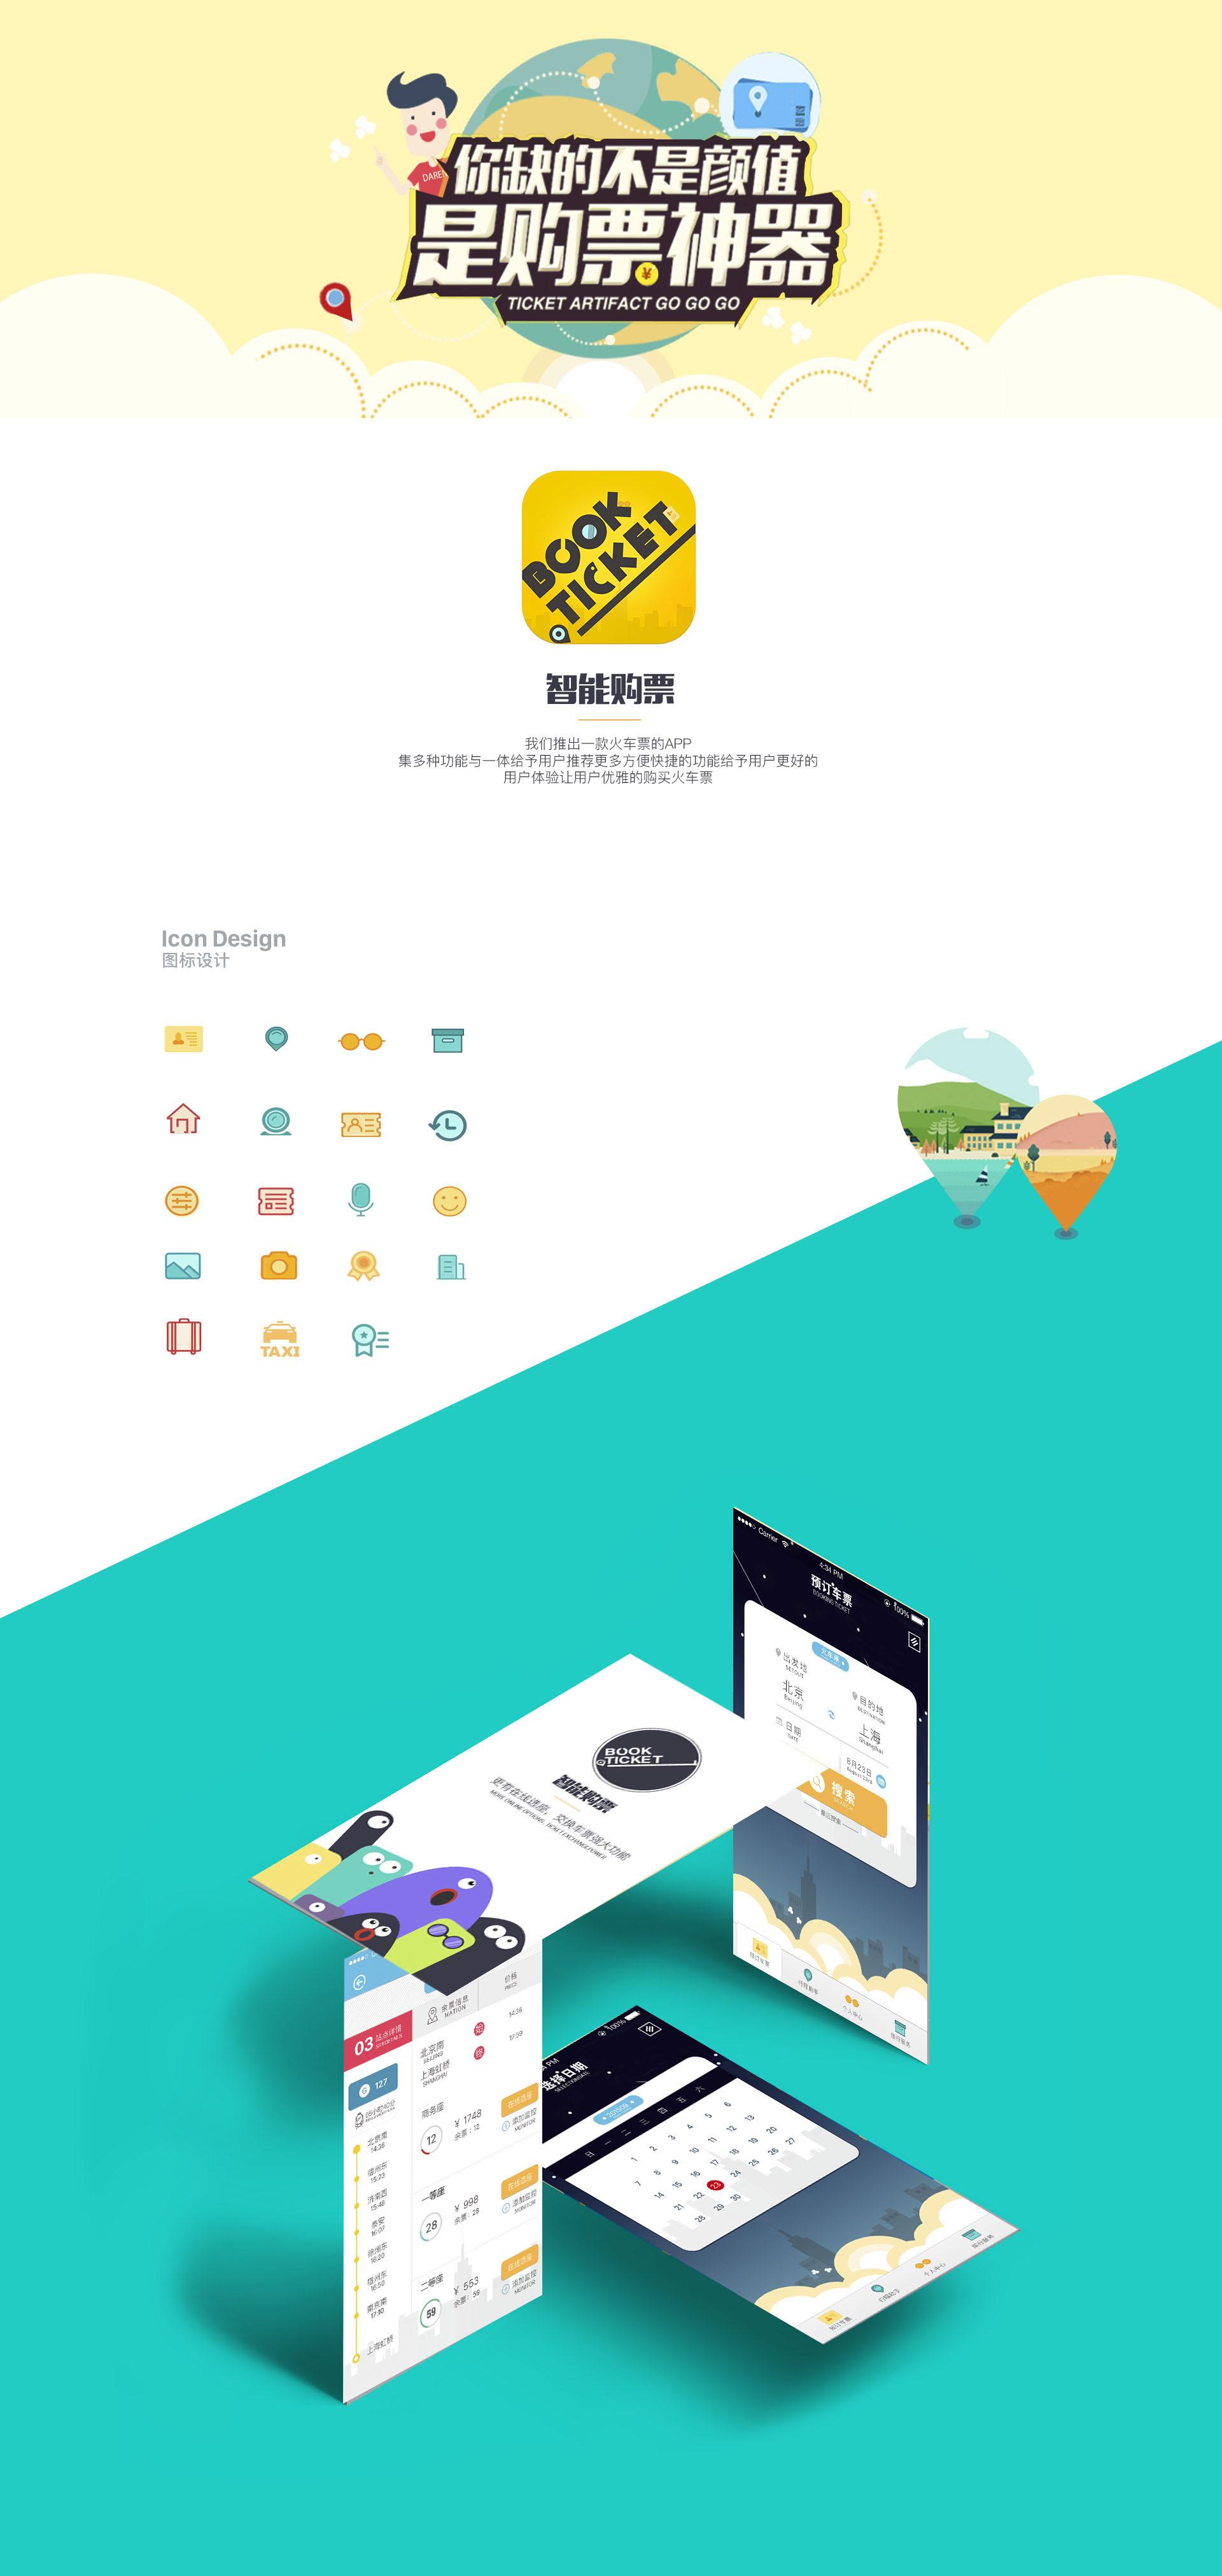 app项目|ui|app界面|设计网杨 - 原创作品 - 站酷图片